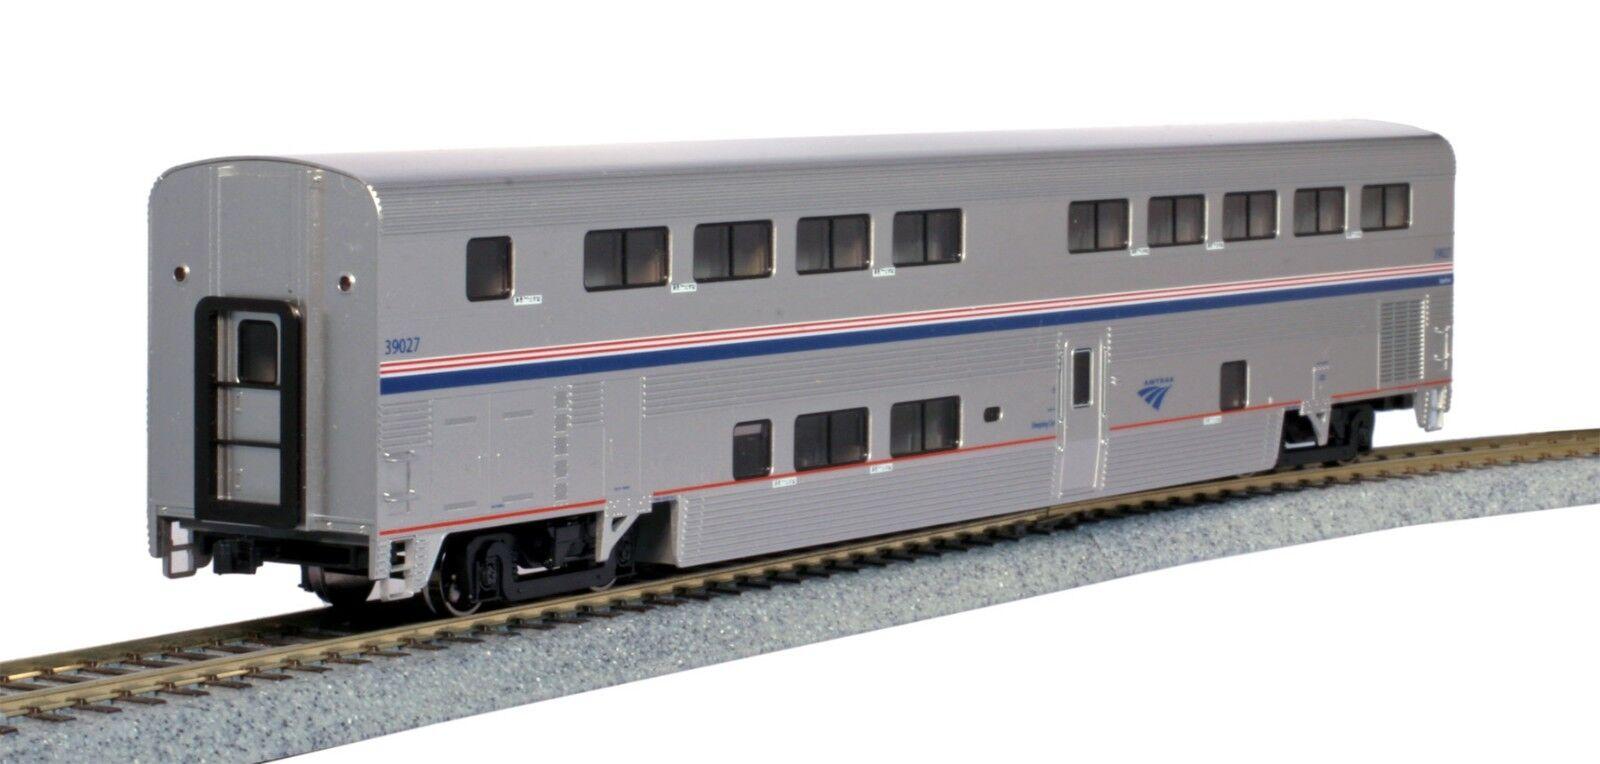 HO Scale KATO 356251 AMTRAK Superliner II Transition Sleeper Phase IVb   39027